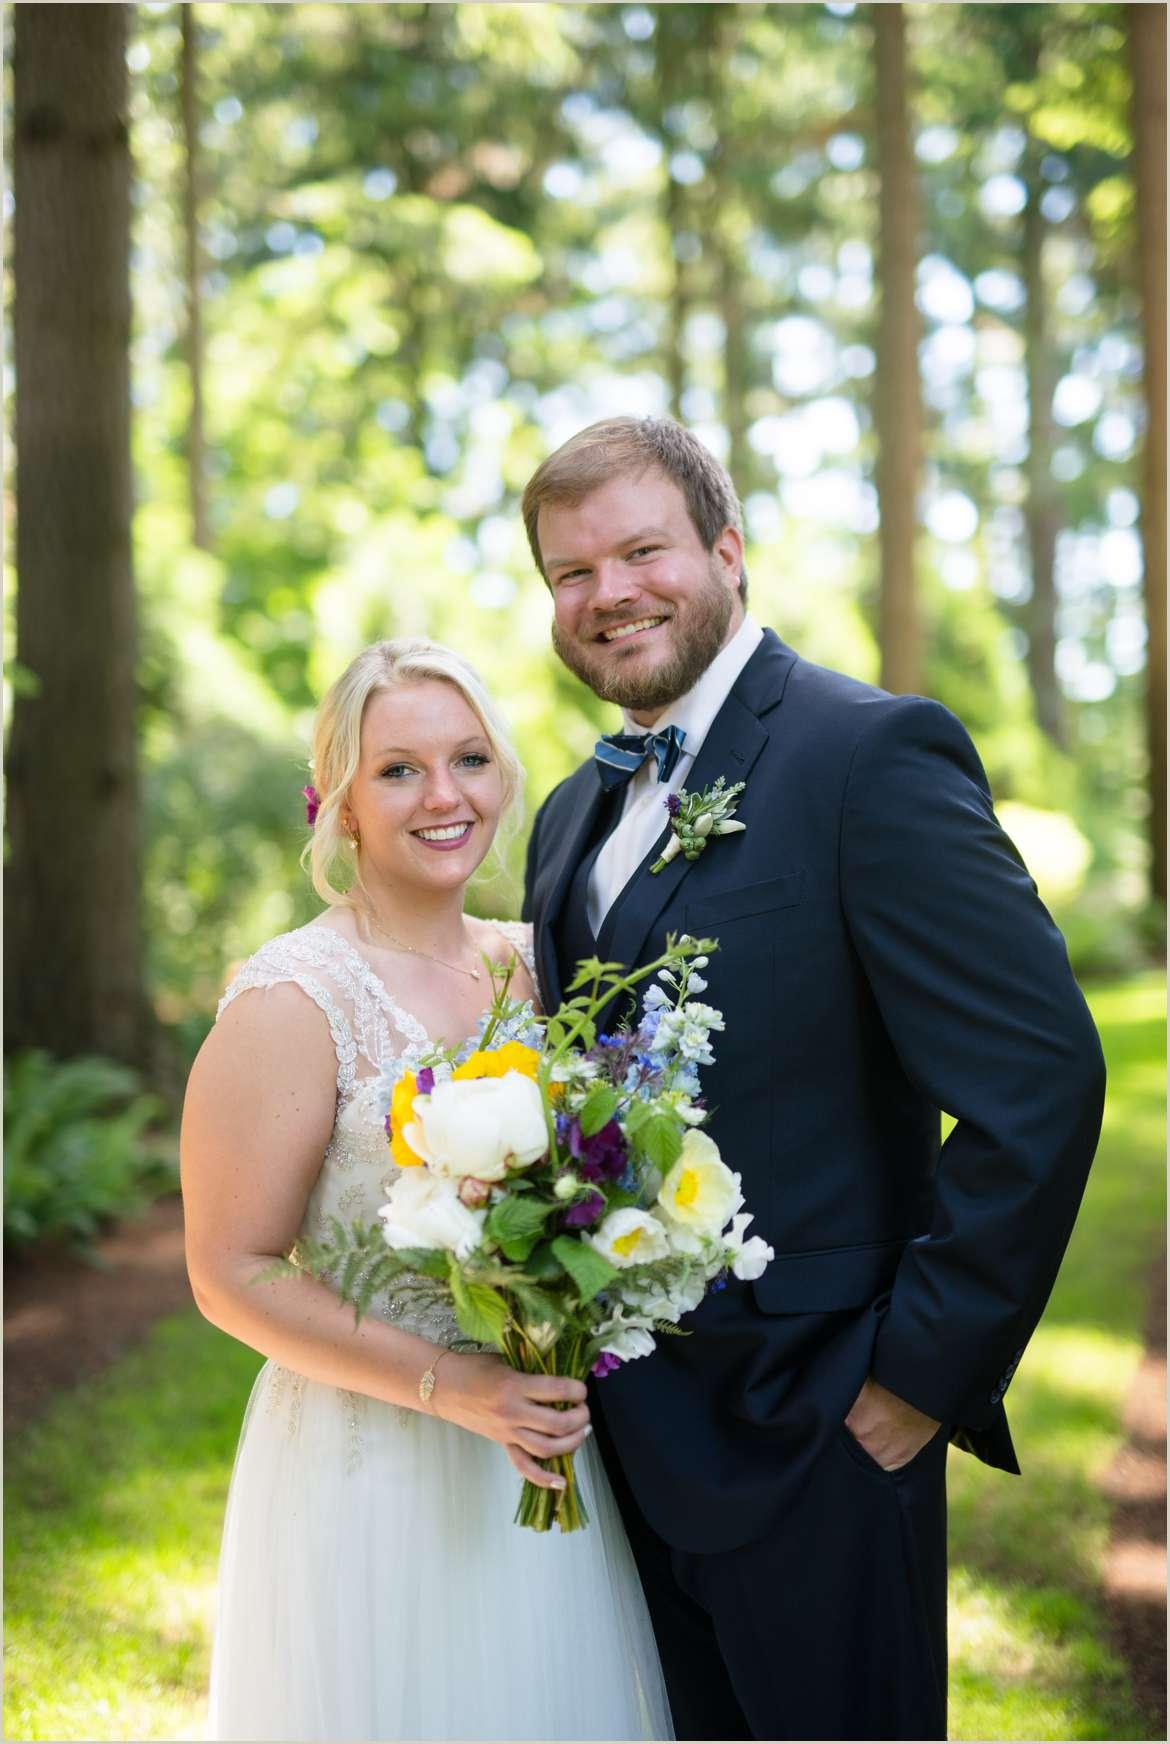 evergreen-gardens-wedding-in-ferndale-washington